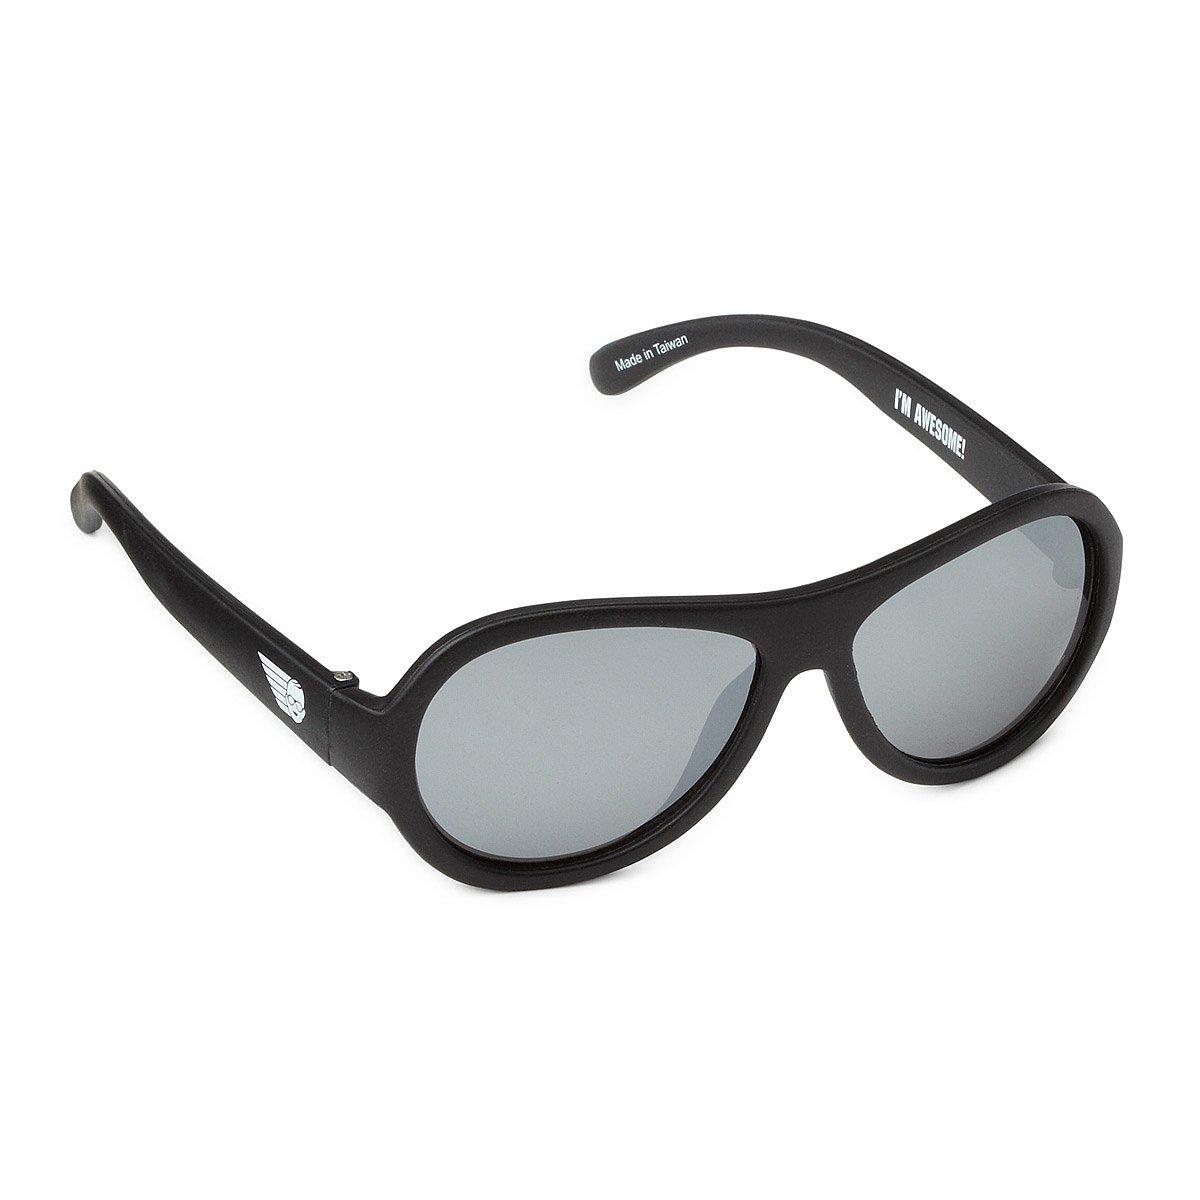 ee032c69f41 Babiators Sunglasses